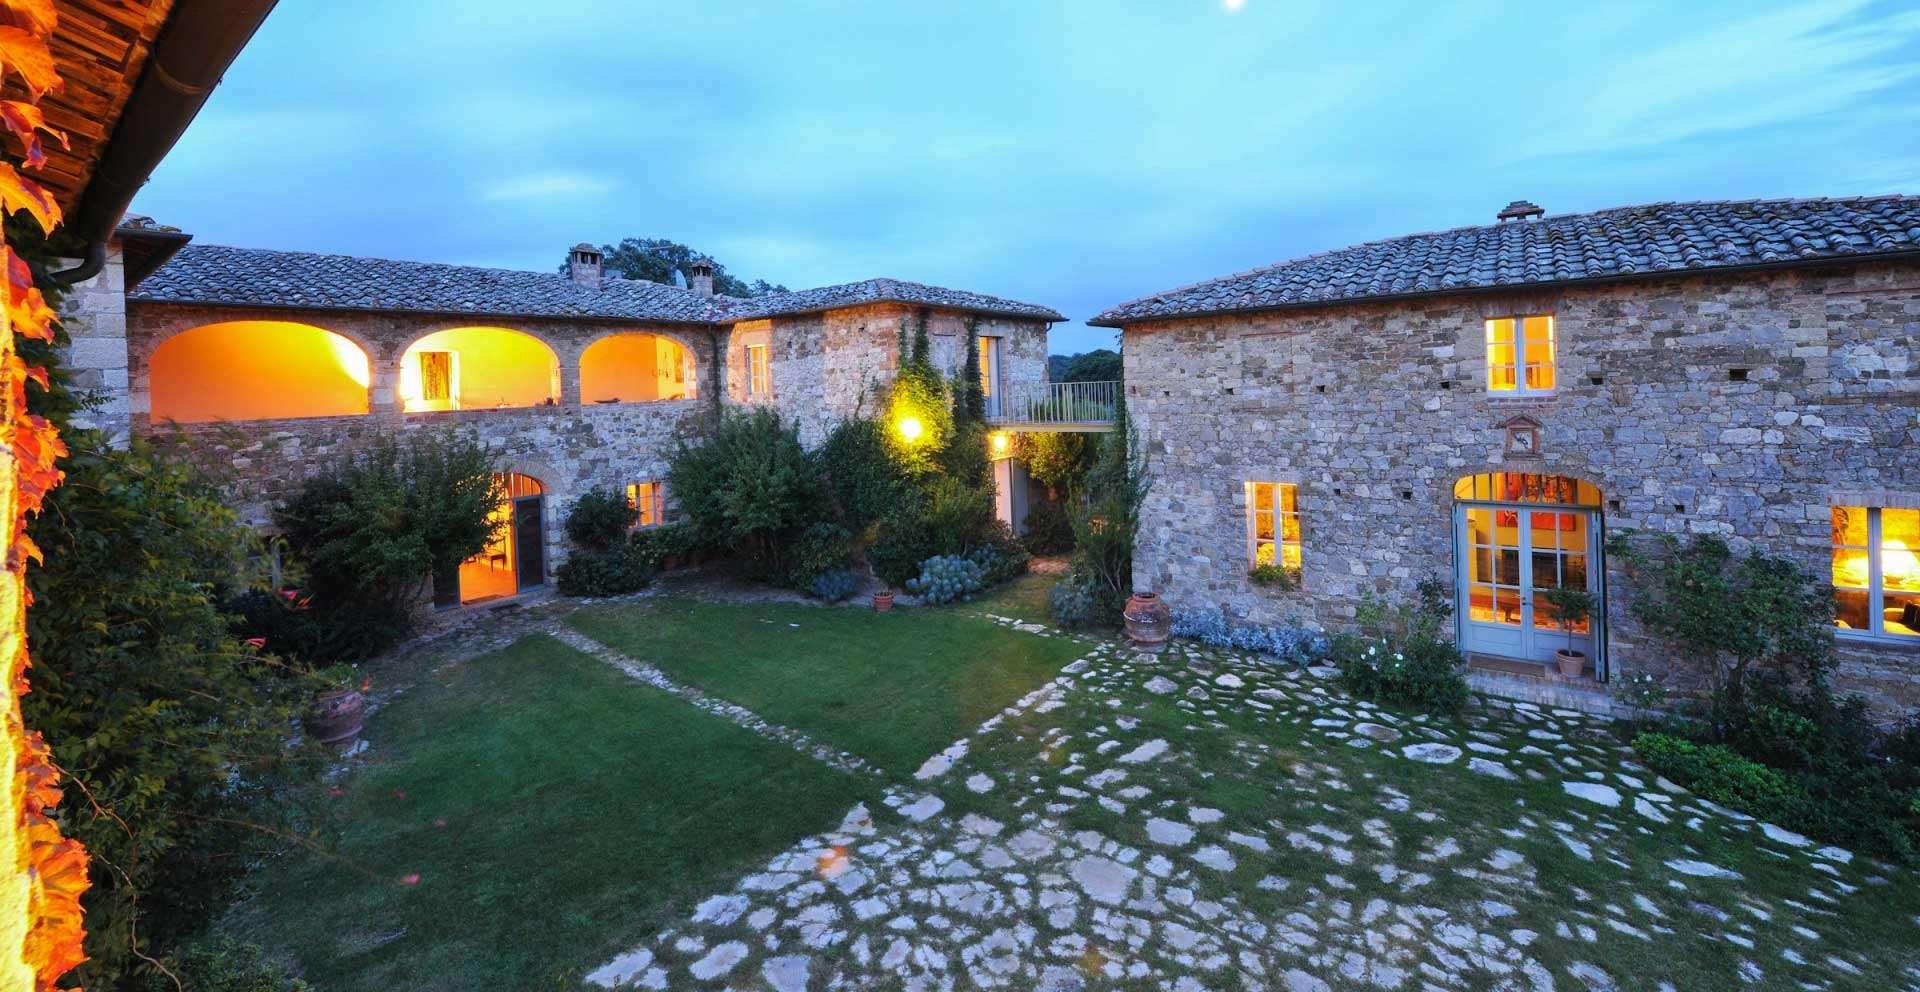 Geggianello villa - Gates lead into the beautiful courtyard.